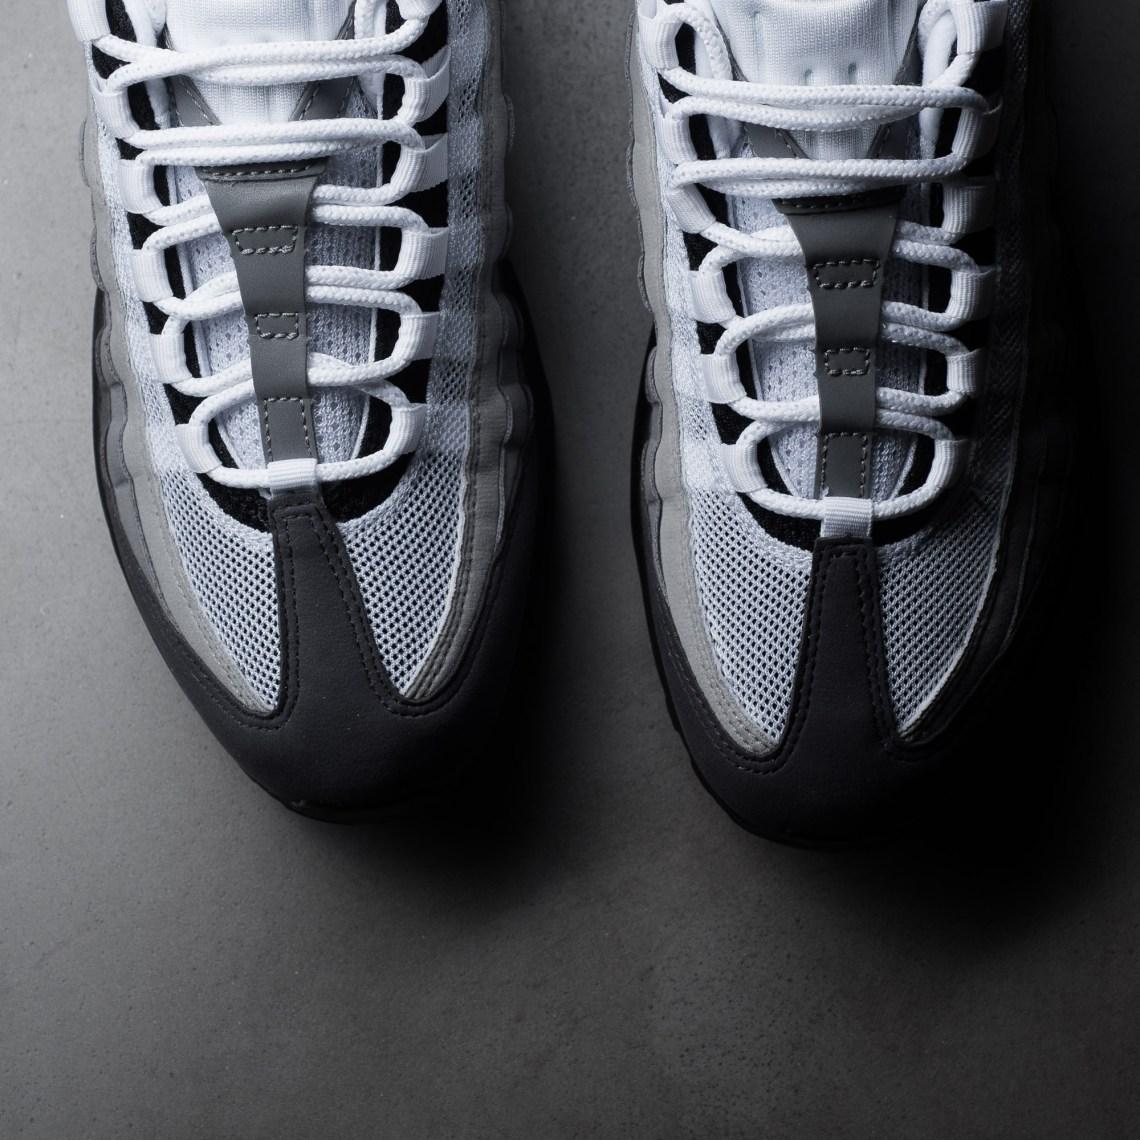 Nike Air Max 95 OG Goes Back to Basics  06d6a194c